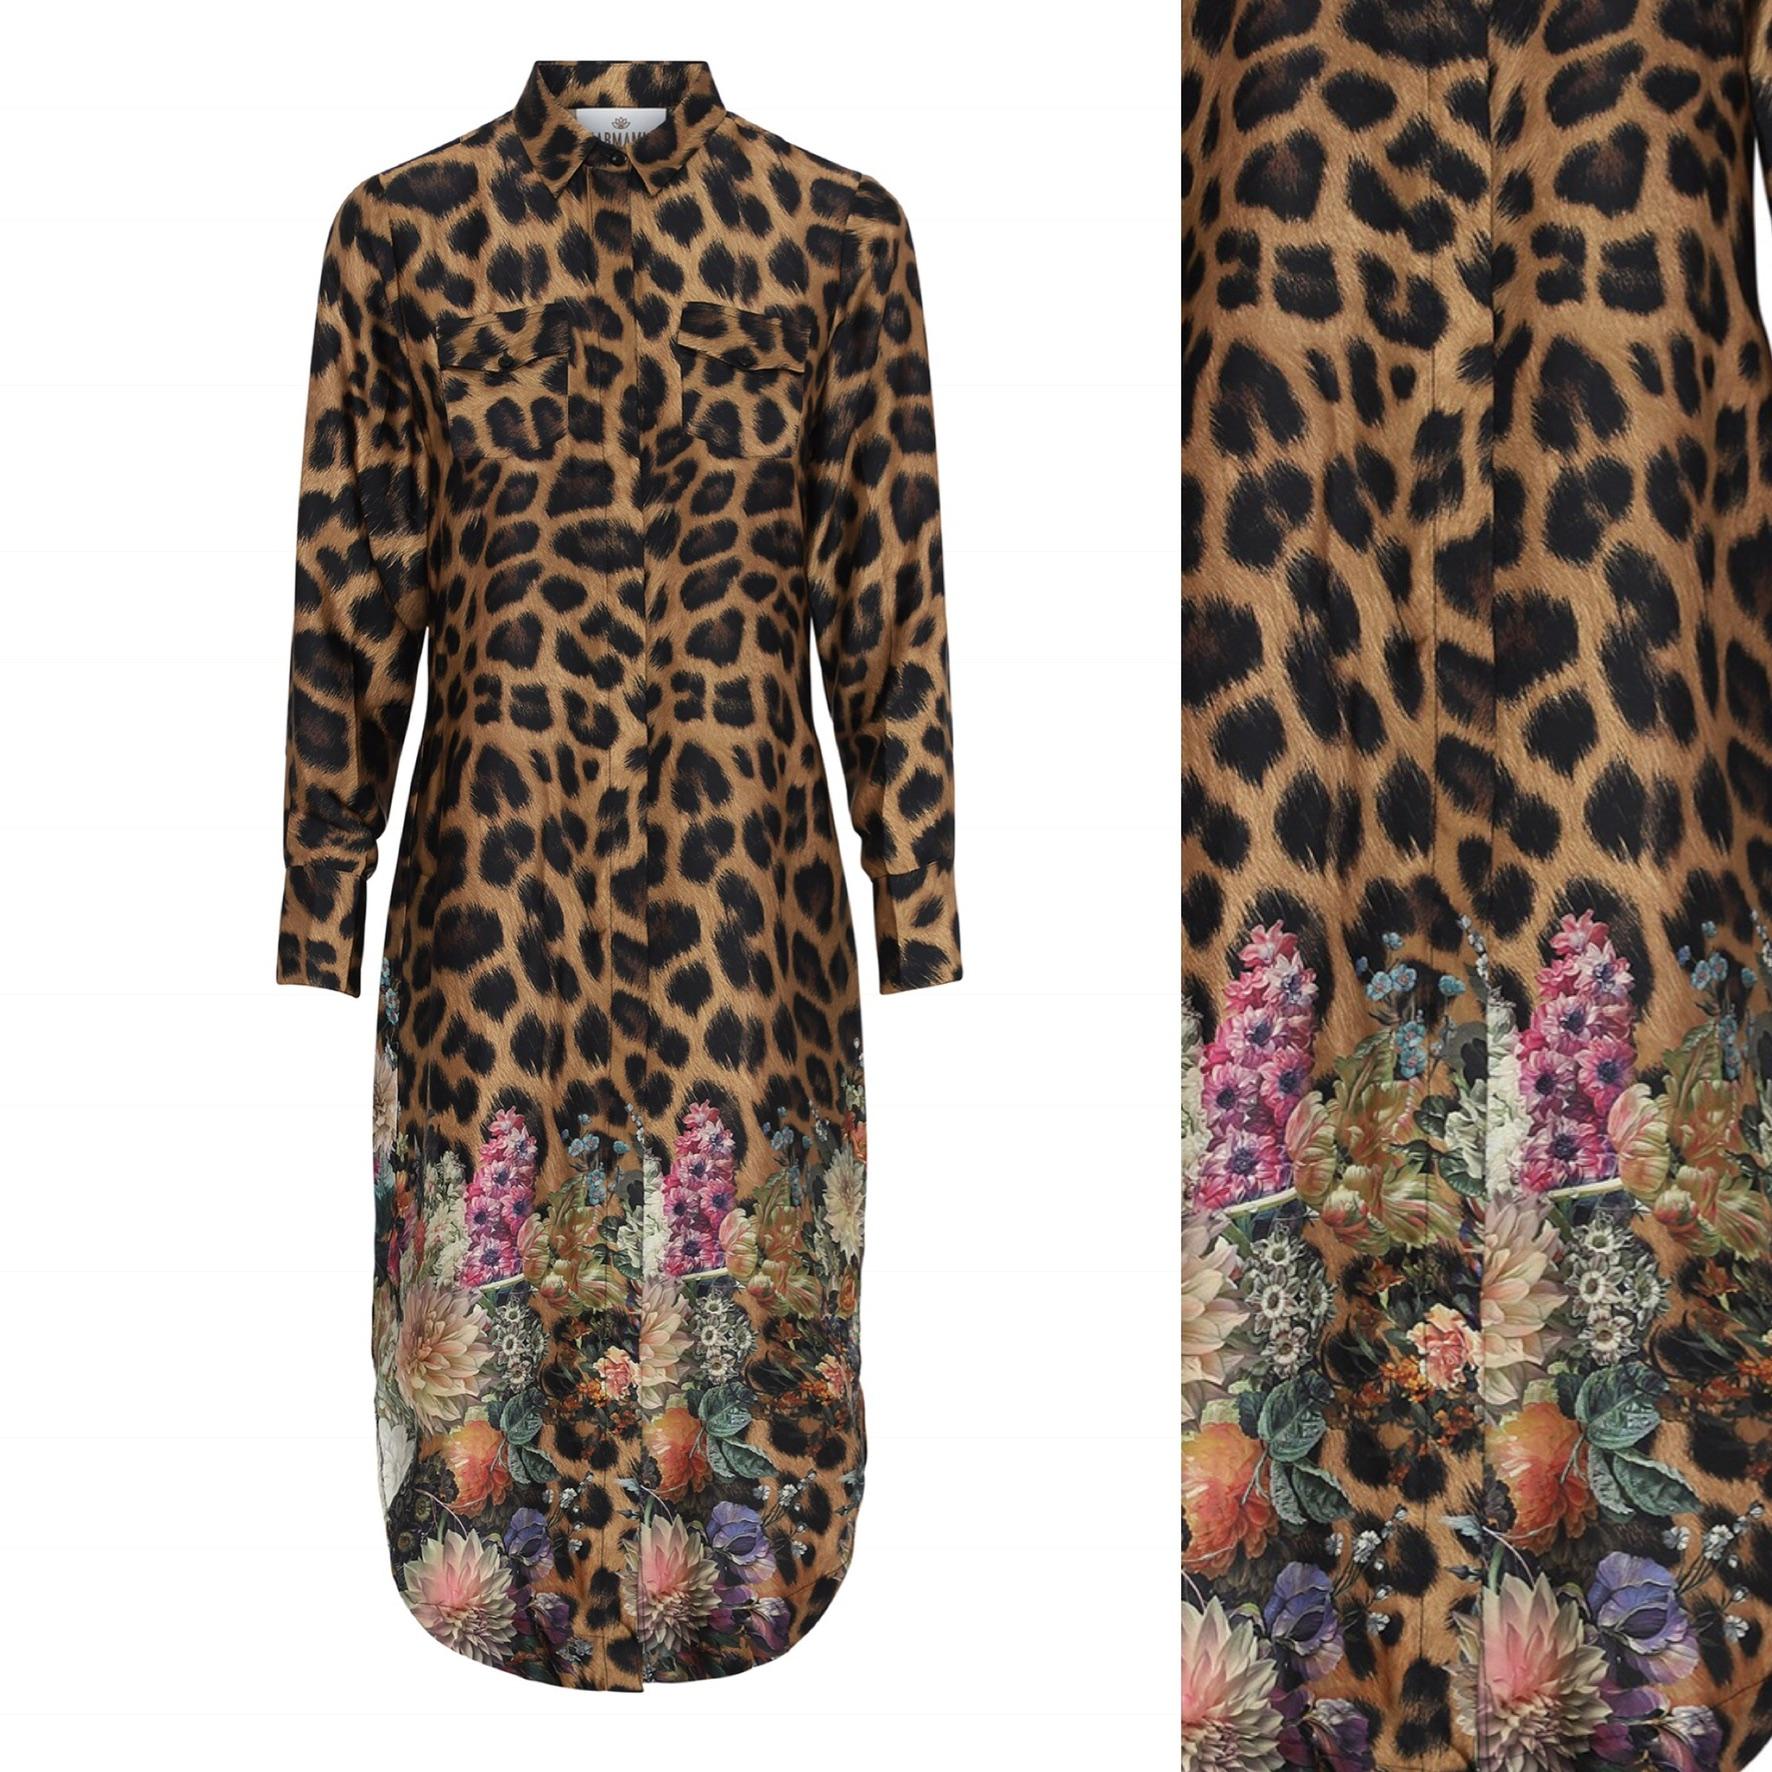 Harper Dress - Flower Leopard IMAGE BY ME KARMAMIA